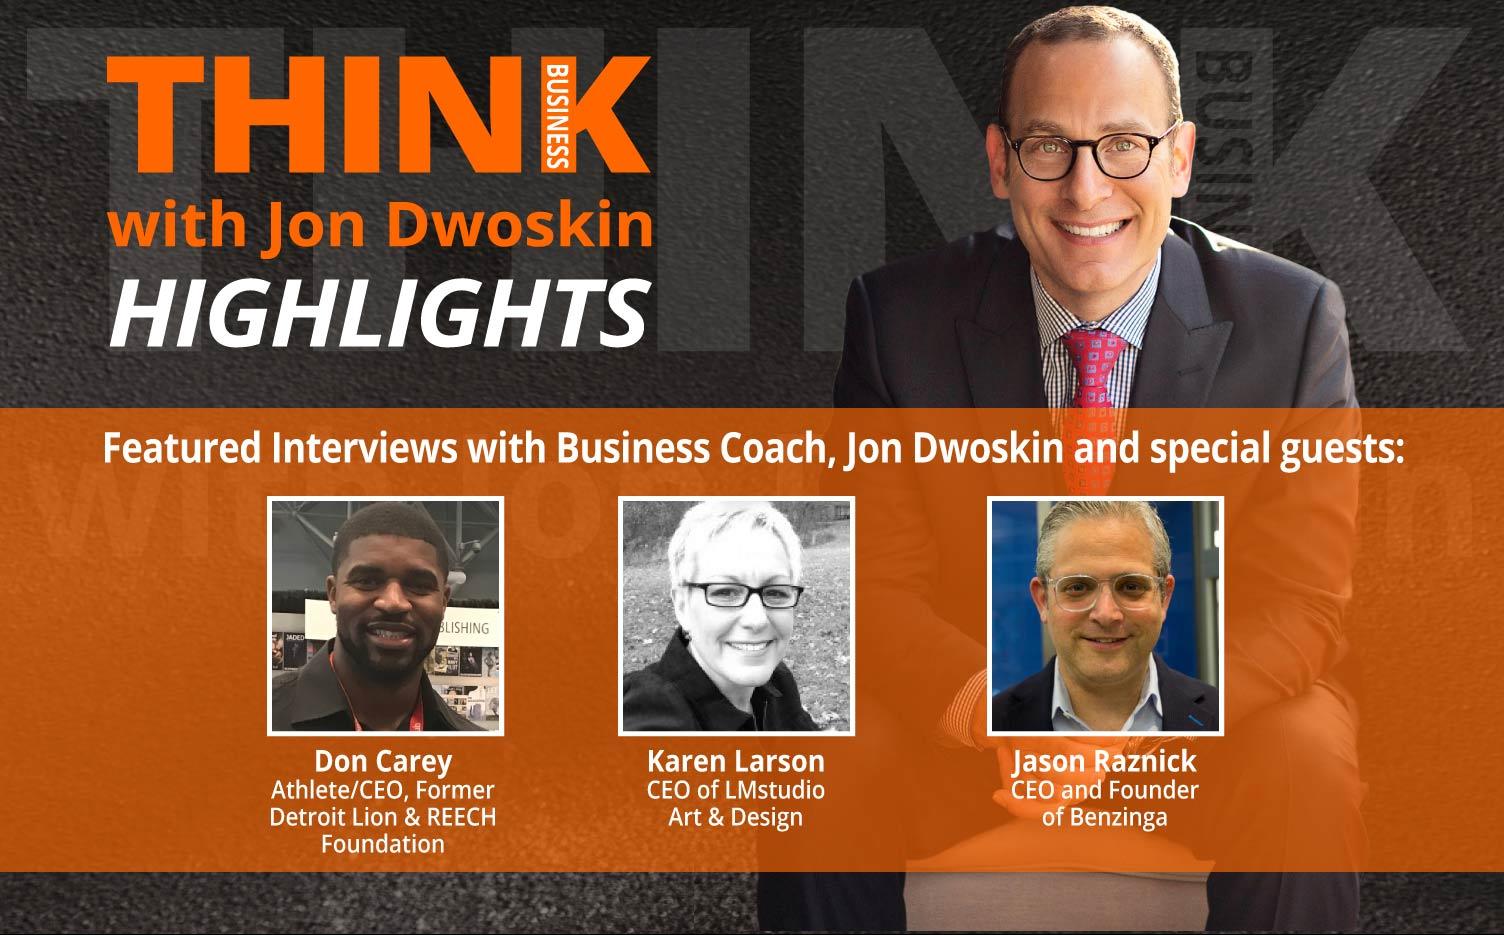 THINK Business: HIGHLIGHTS – Jon Dwoskin Featured Interviews with Don Carey, Karen Larson, Jason Raznick